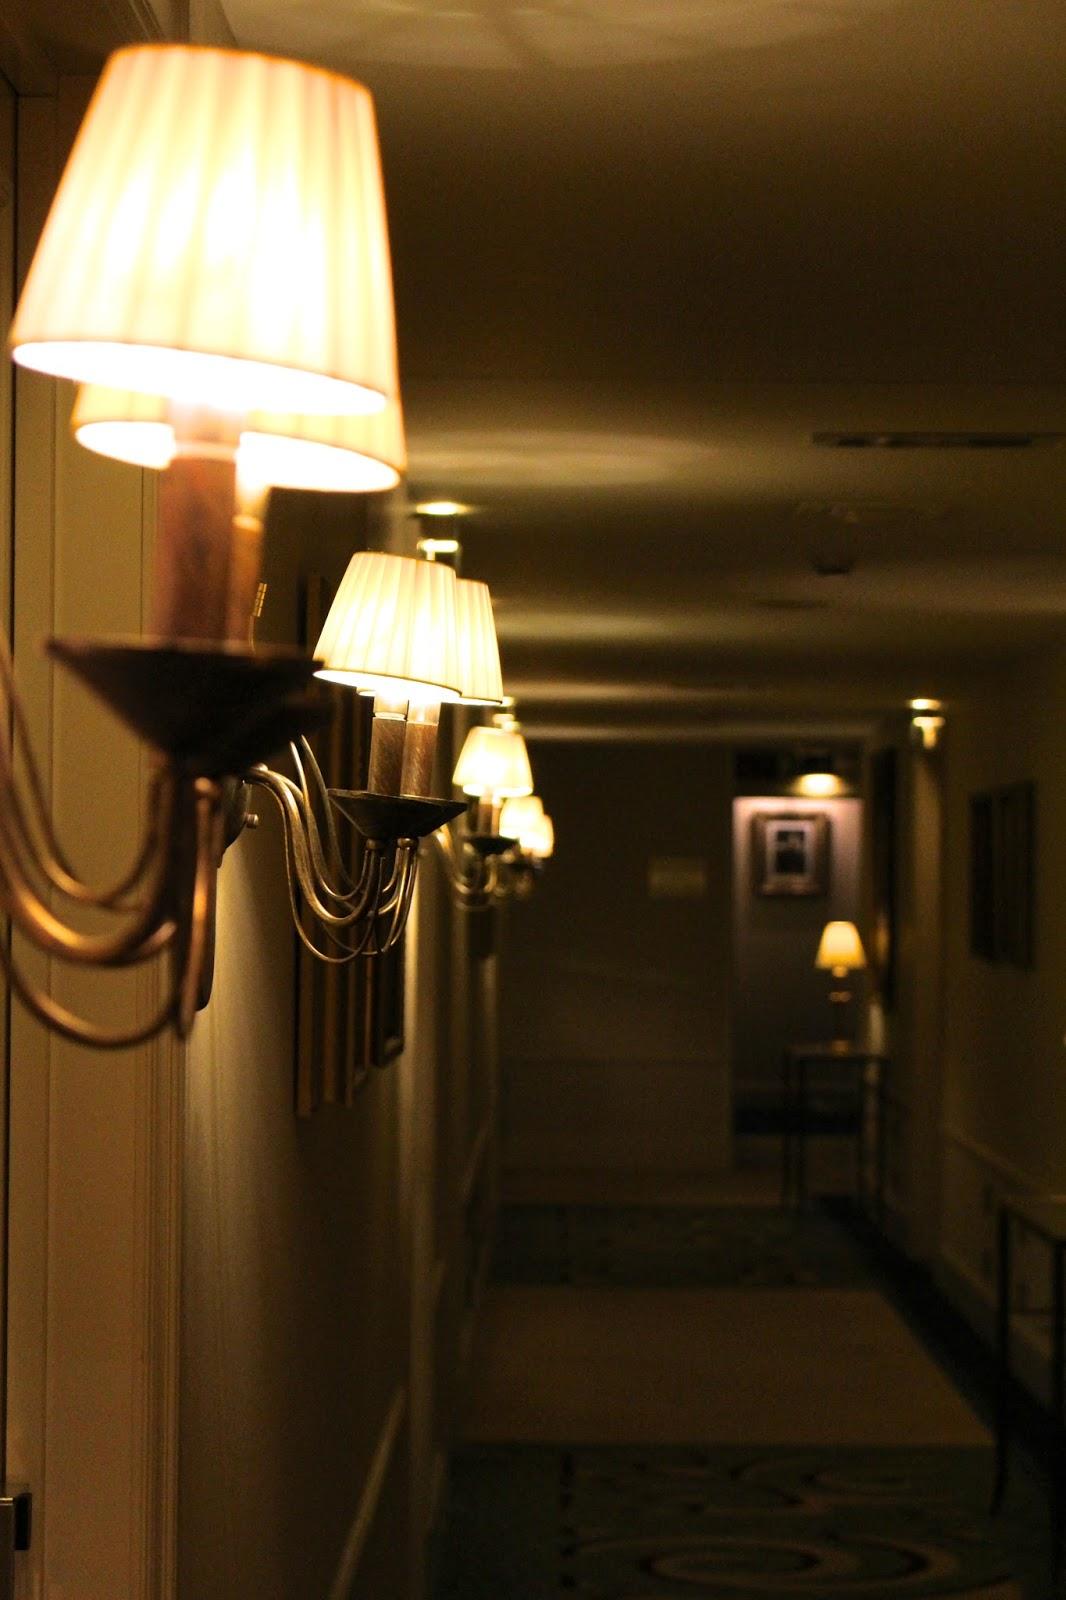 Luxury hotel's corridor by night